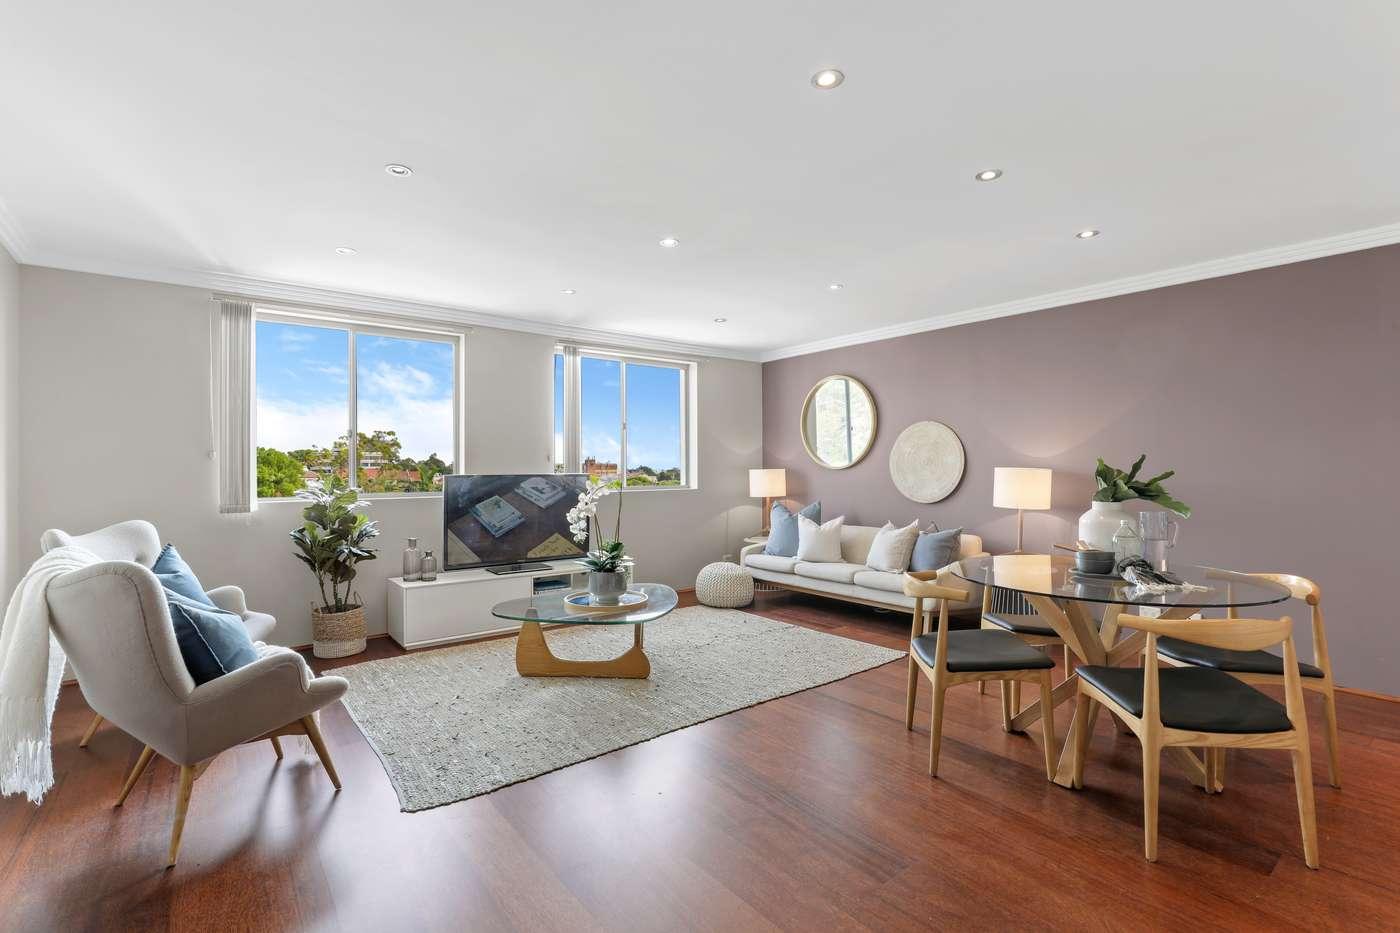 Main view of Homely apartment listing, 20/5 Croydon Street, Petersham, NSW 2049